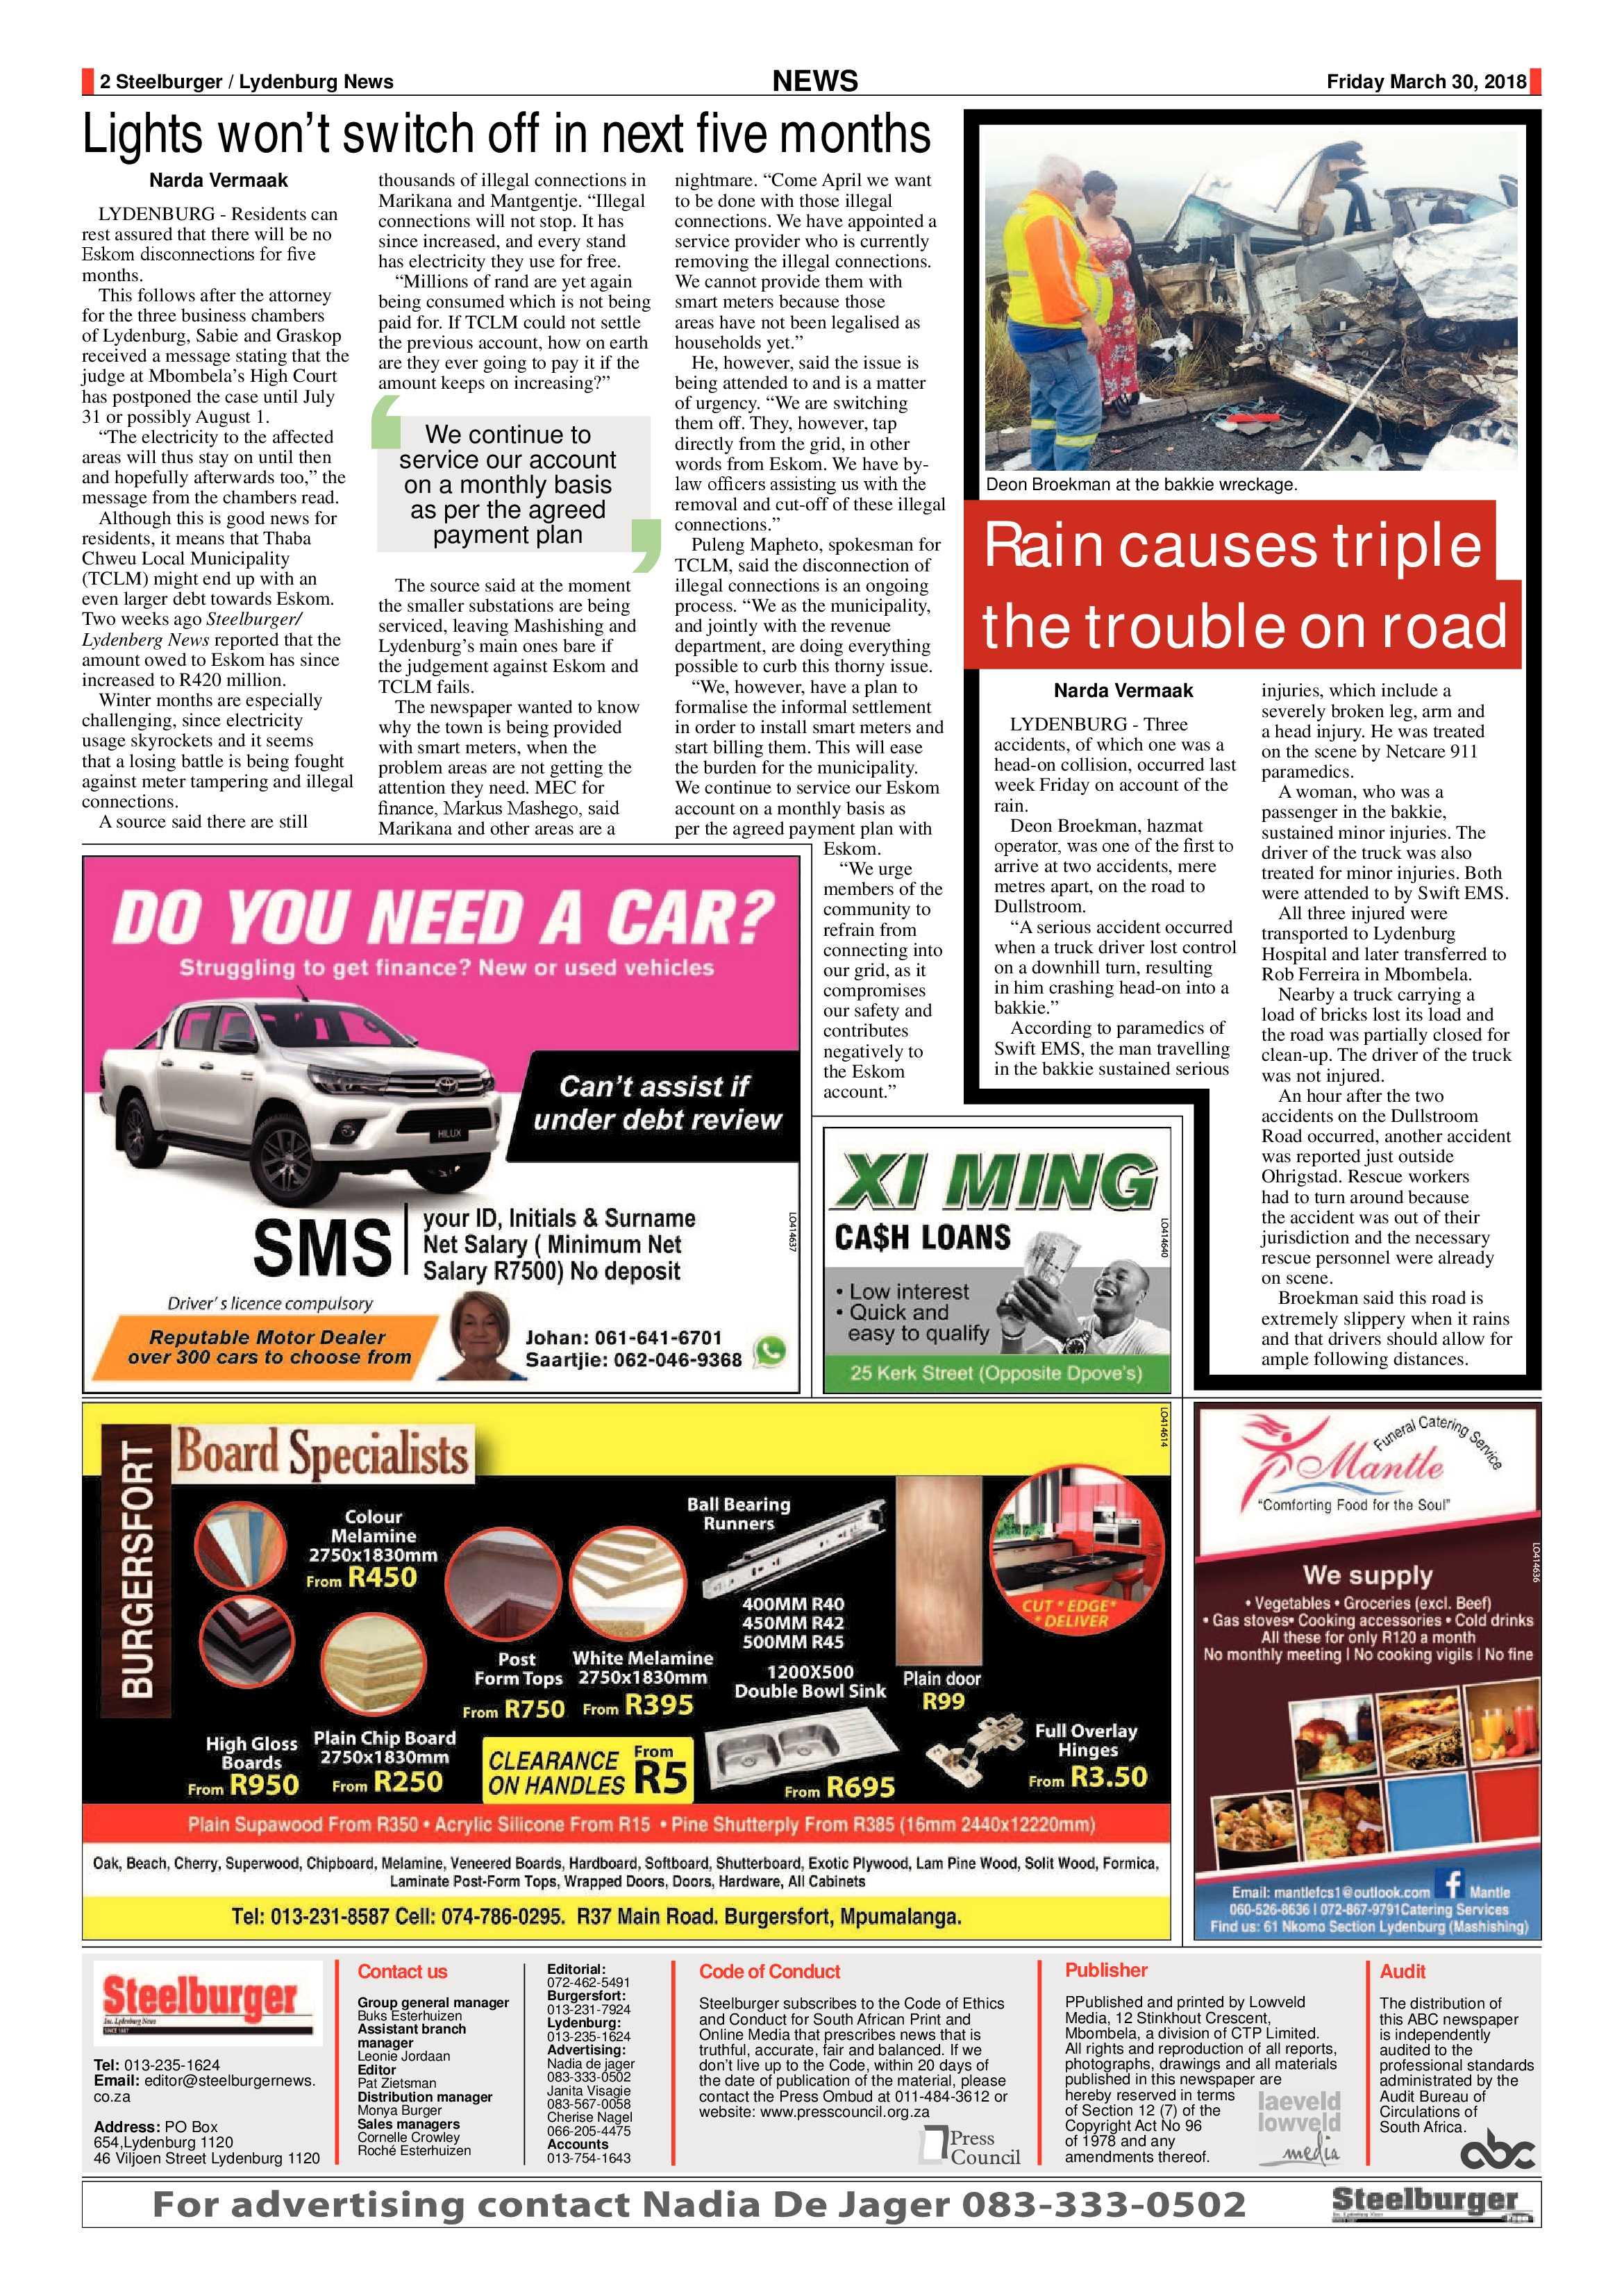 Steelburger News 30 March 2018 | Steelburger / Lydenburg News